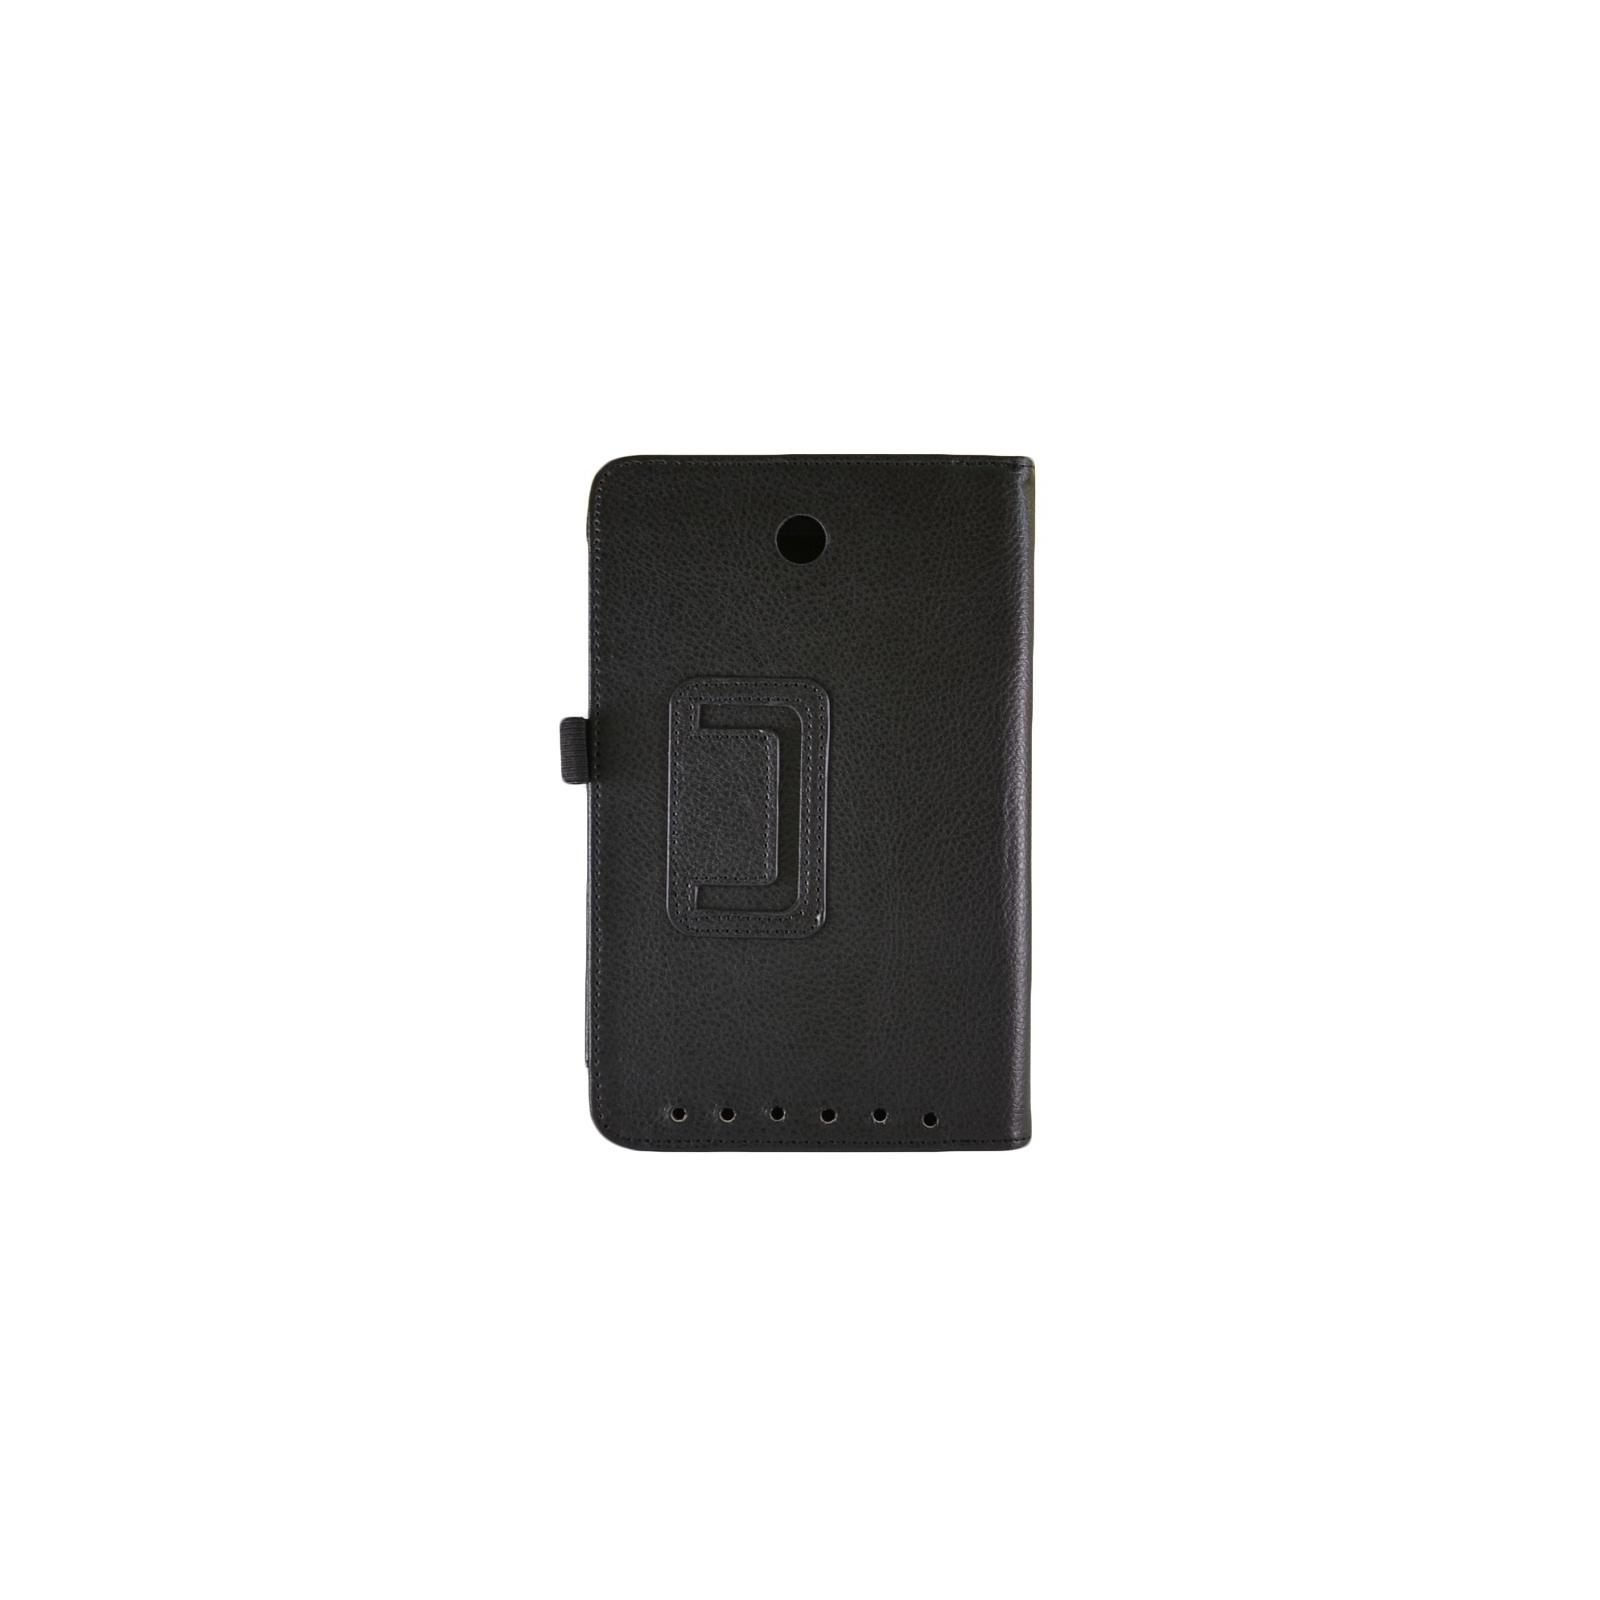 "Чехол для планшета Pro-case 7"" Pro-case Asus Memo Pad ME173 7"" (ME173 7"") изображение 2"